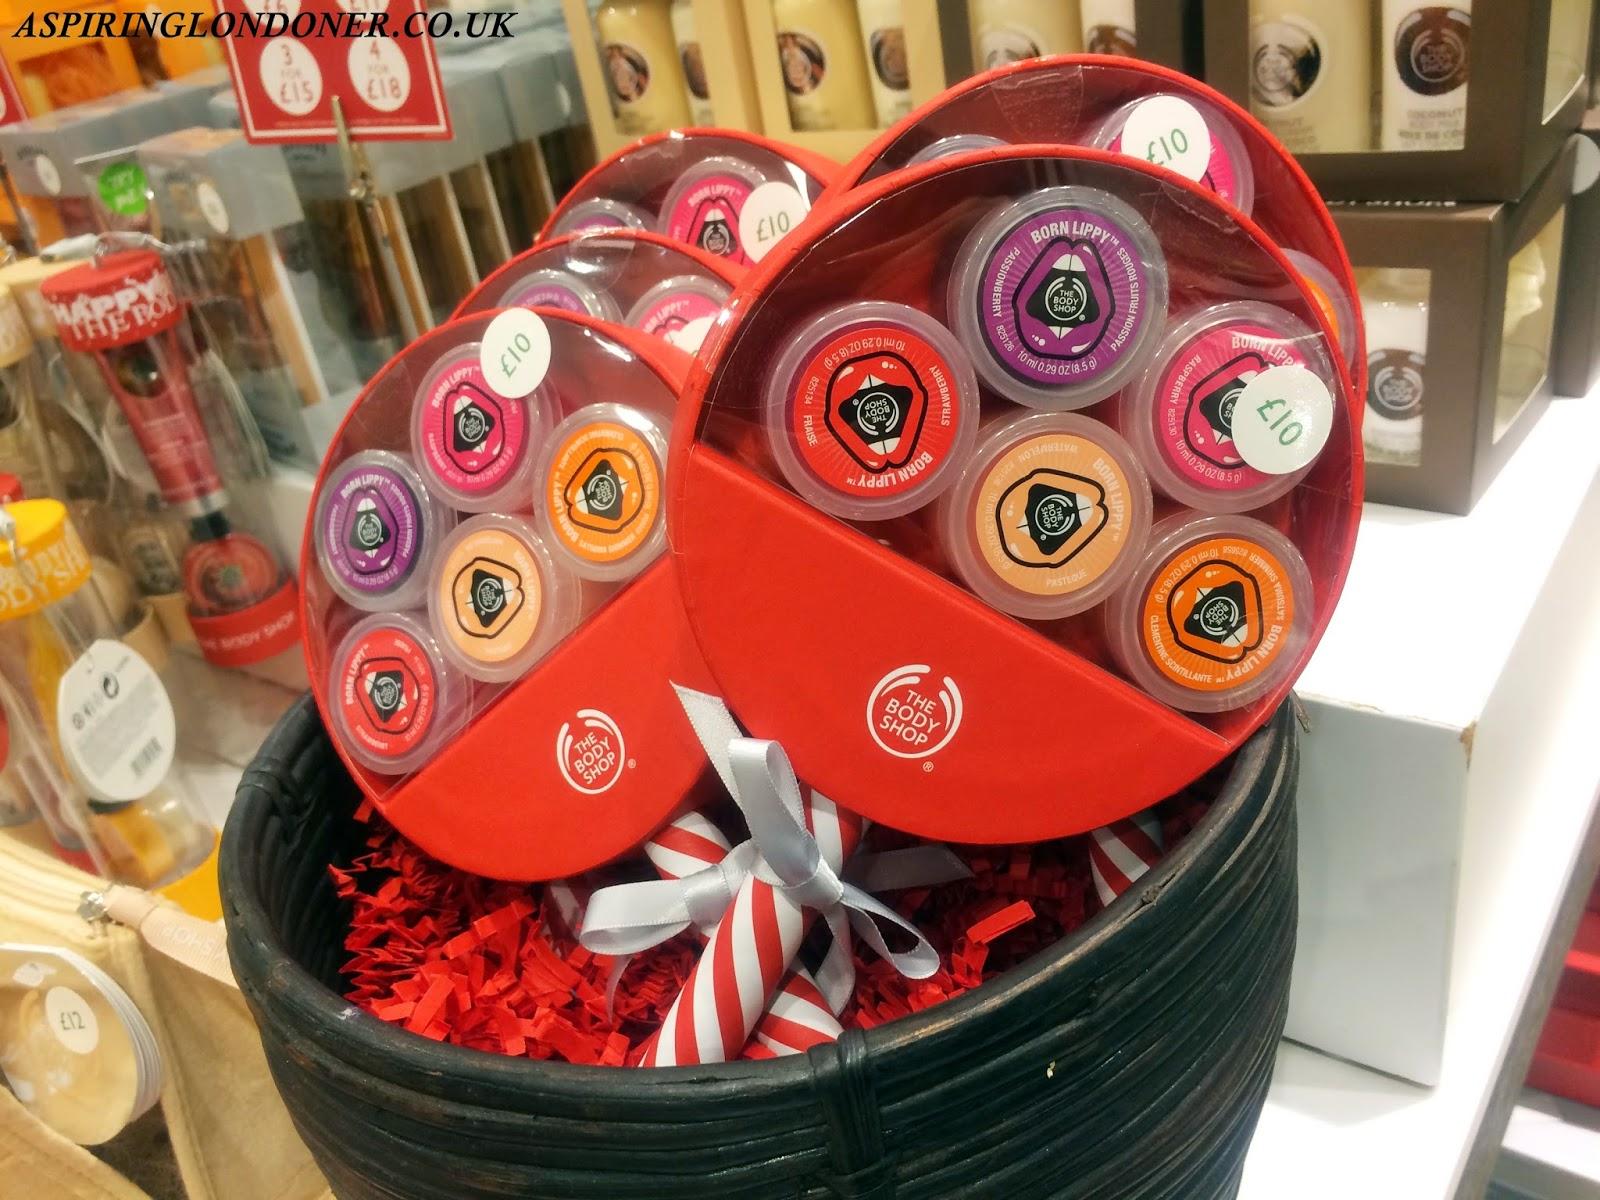 The Body Shop Christmas Gift Sets - Aspiring Londoner